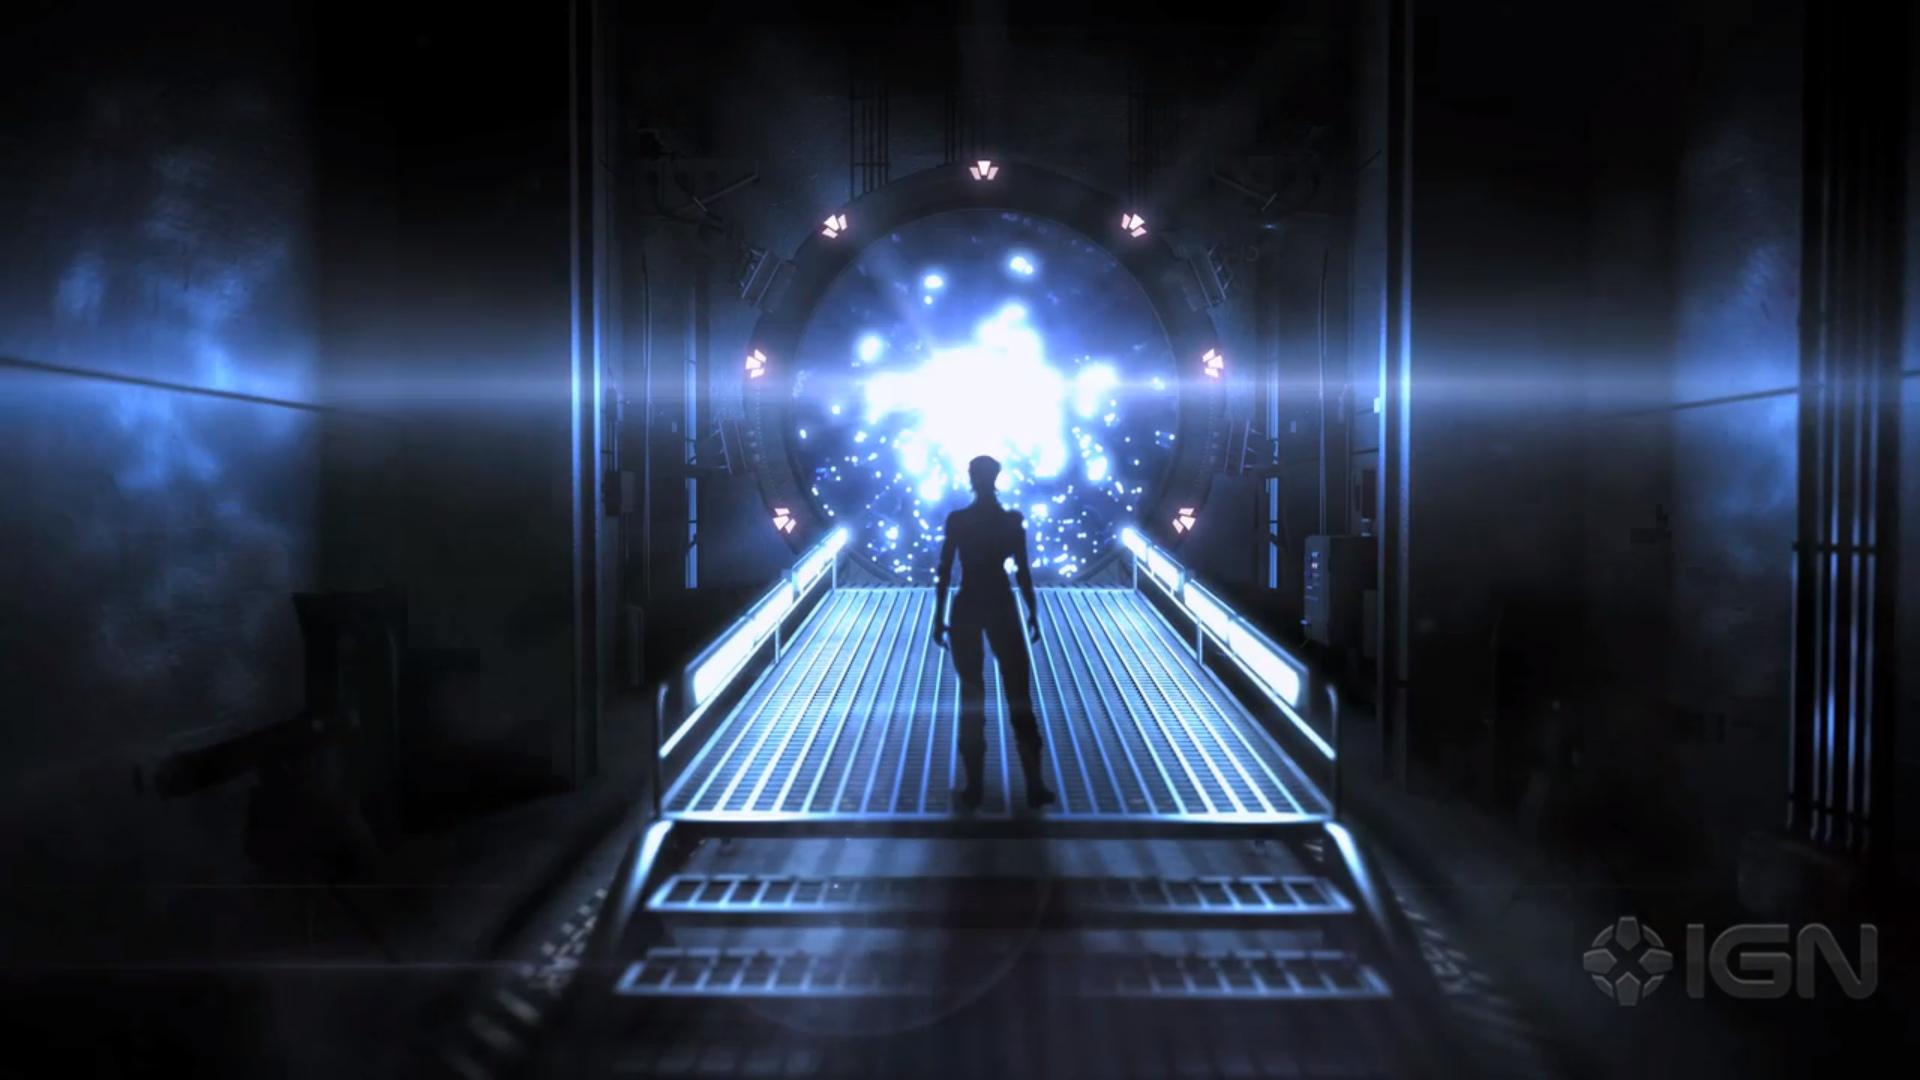 Stargate SG1 Unleashed Screen shot